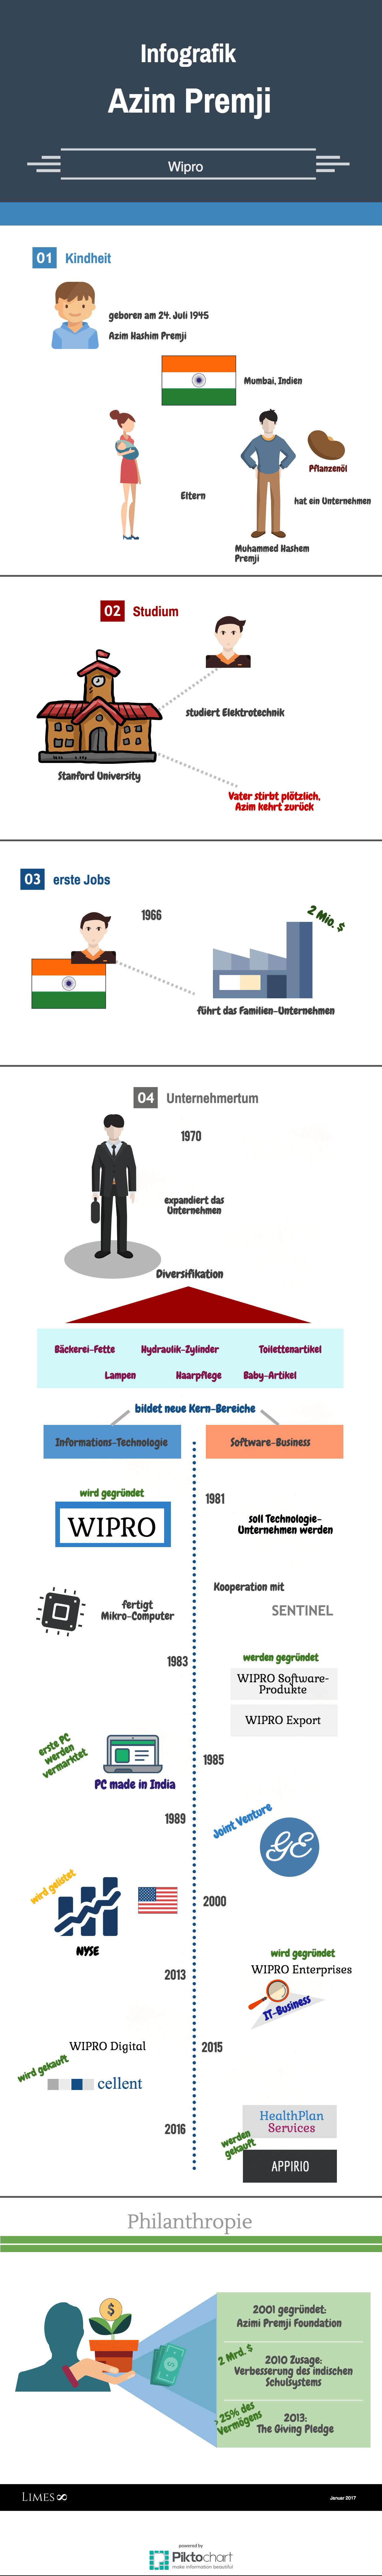 Informationsgrafik des Milliardärs Azim Premji